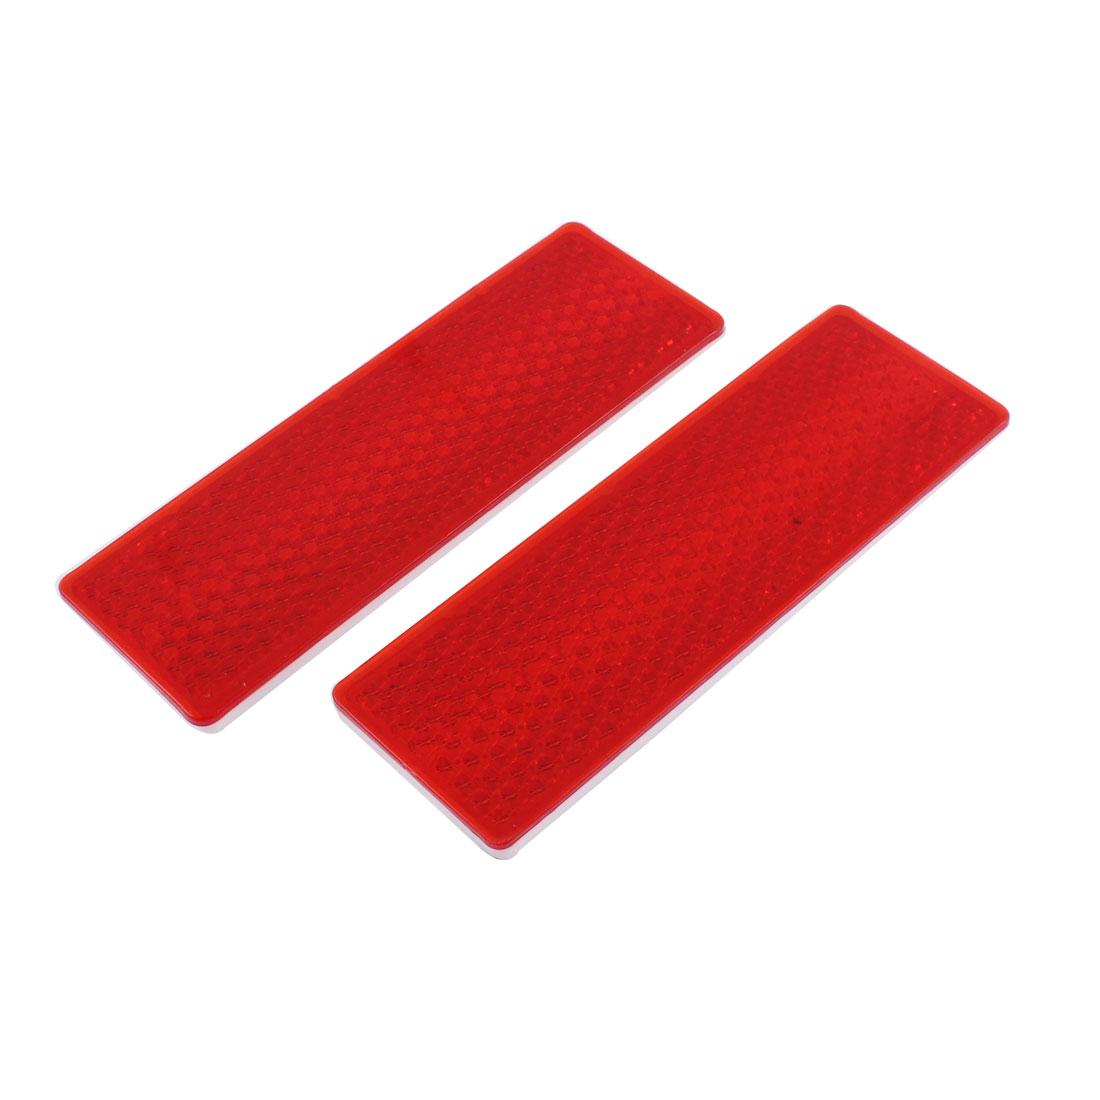 Truck Car Red Plastic Reflective Sign Reflector 15cm Long 2pcs